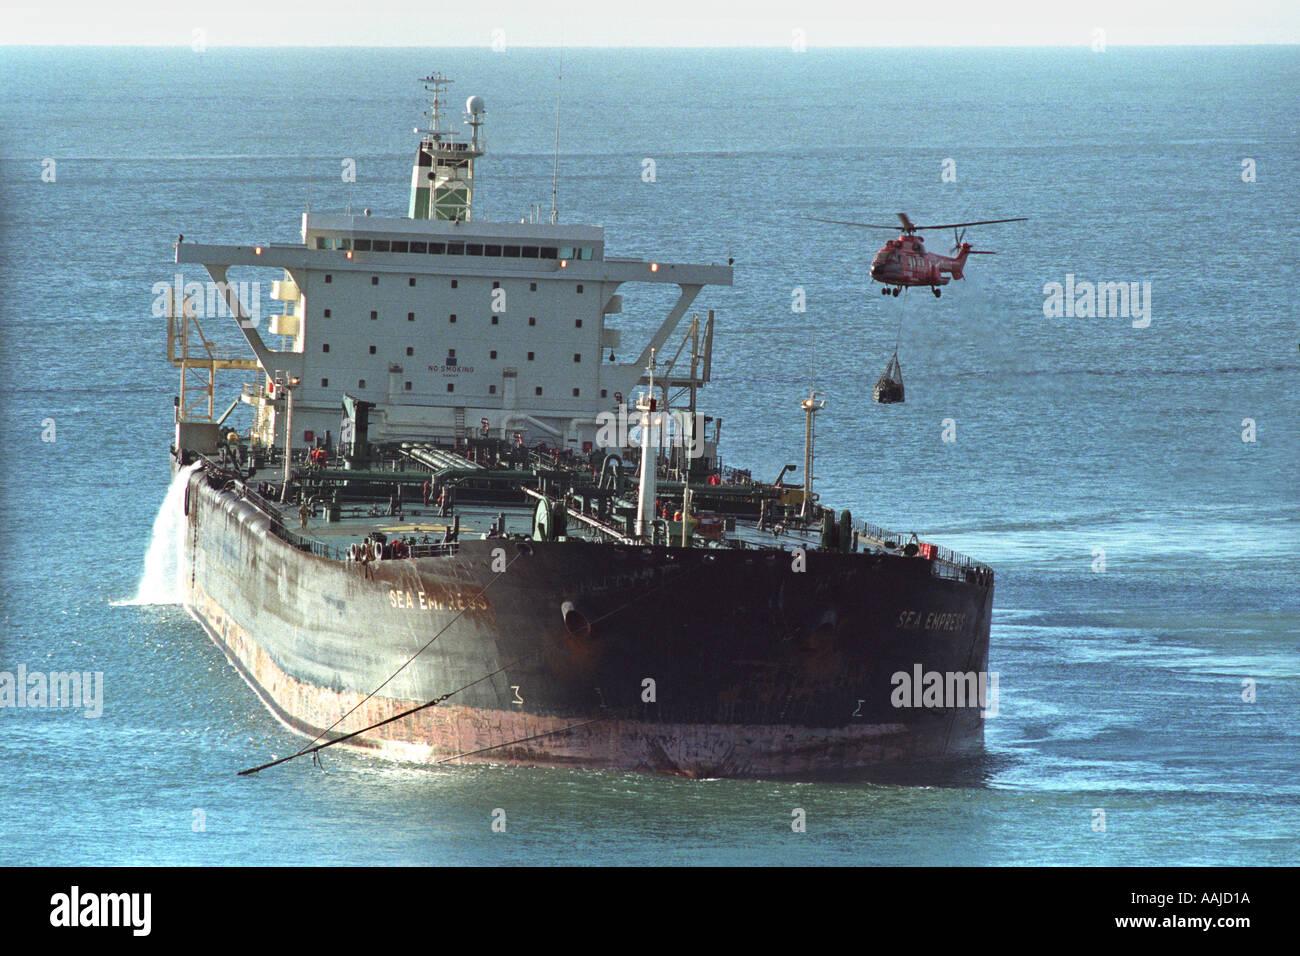 Sea Empress Ship Stock Photos & Sea Empress Ship Stock Images - Alamy